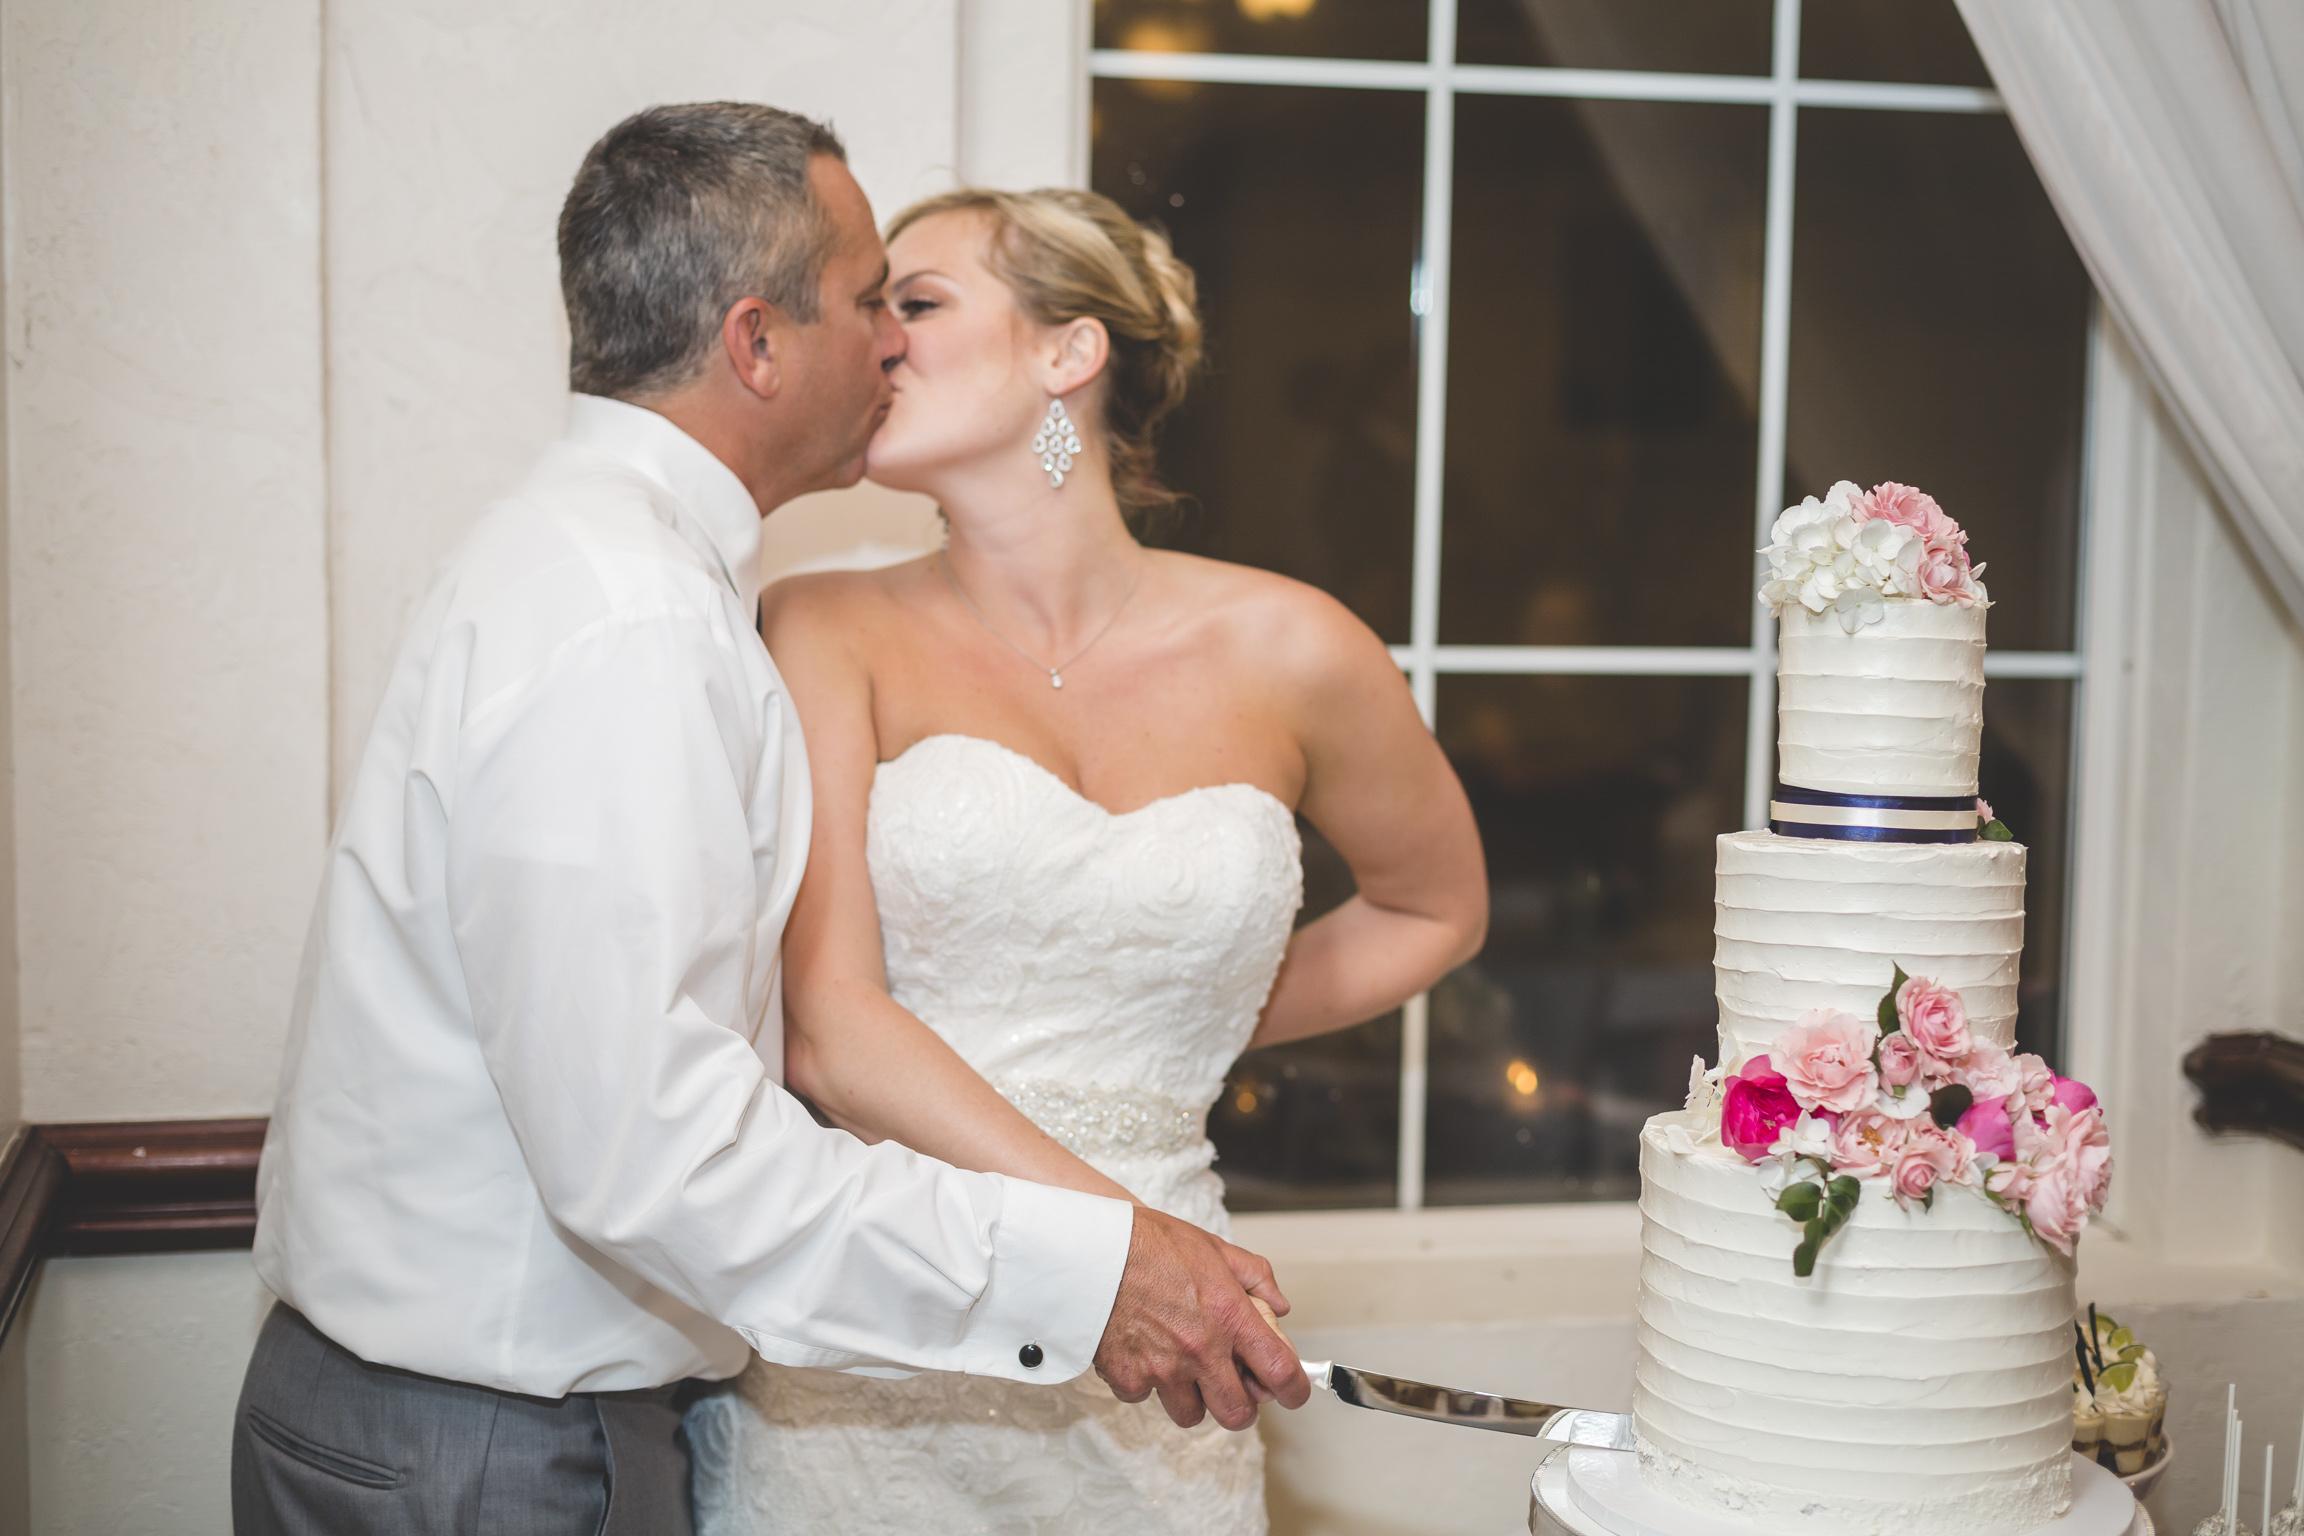 adam-szarmack-casa-marina-wedding-photographer-jacksonville-beach-florida-50.jpg